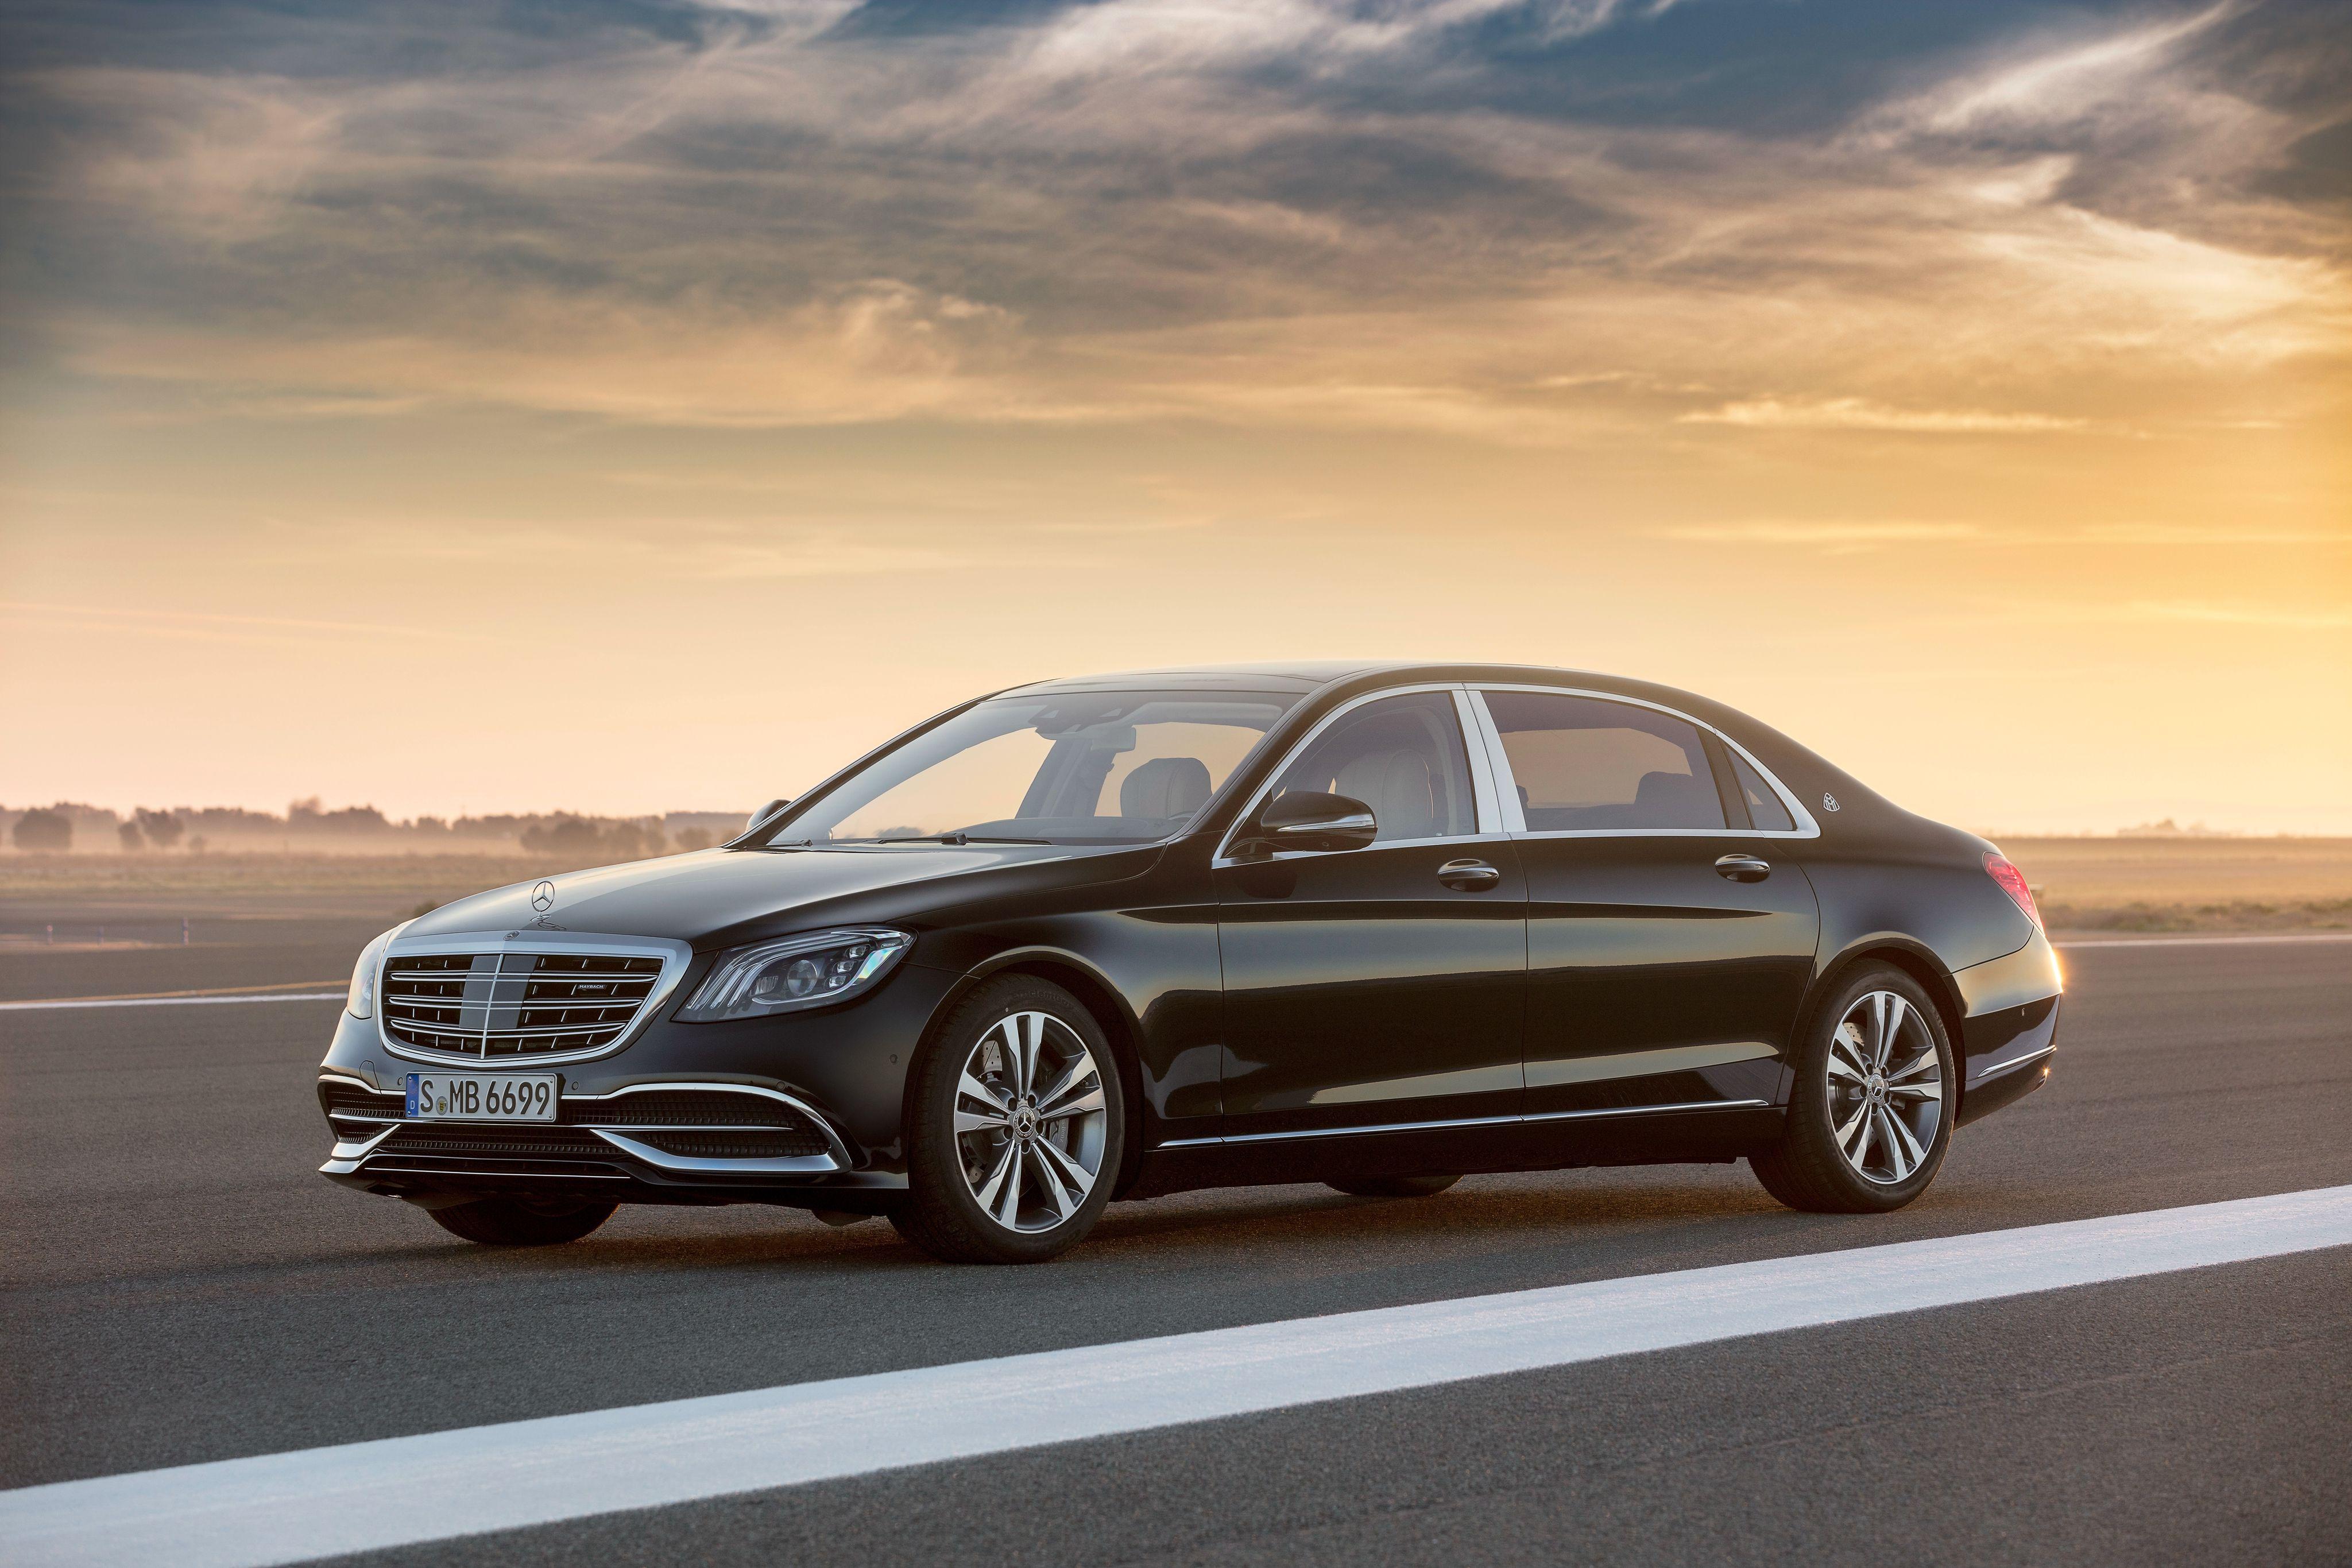 Mercedes Benz S Klasse Maybach – Auto Bild Idee